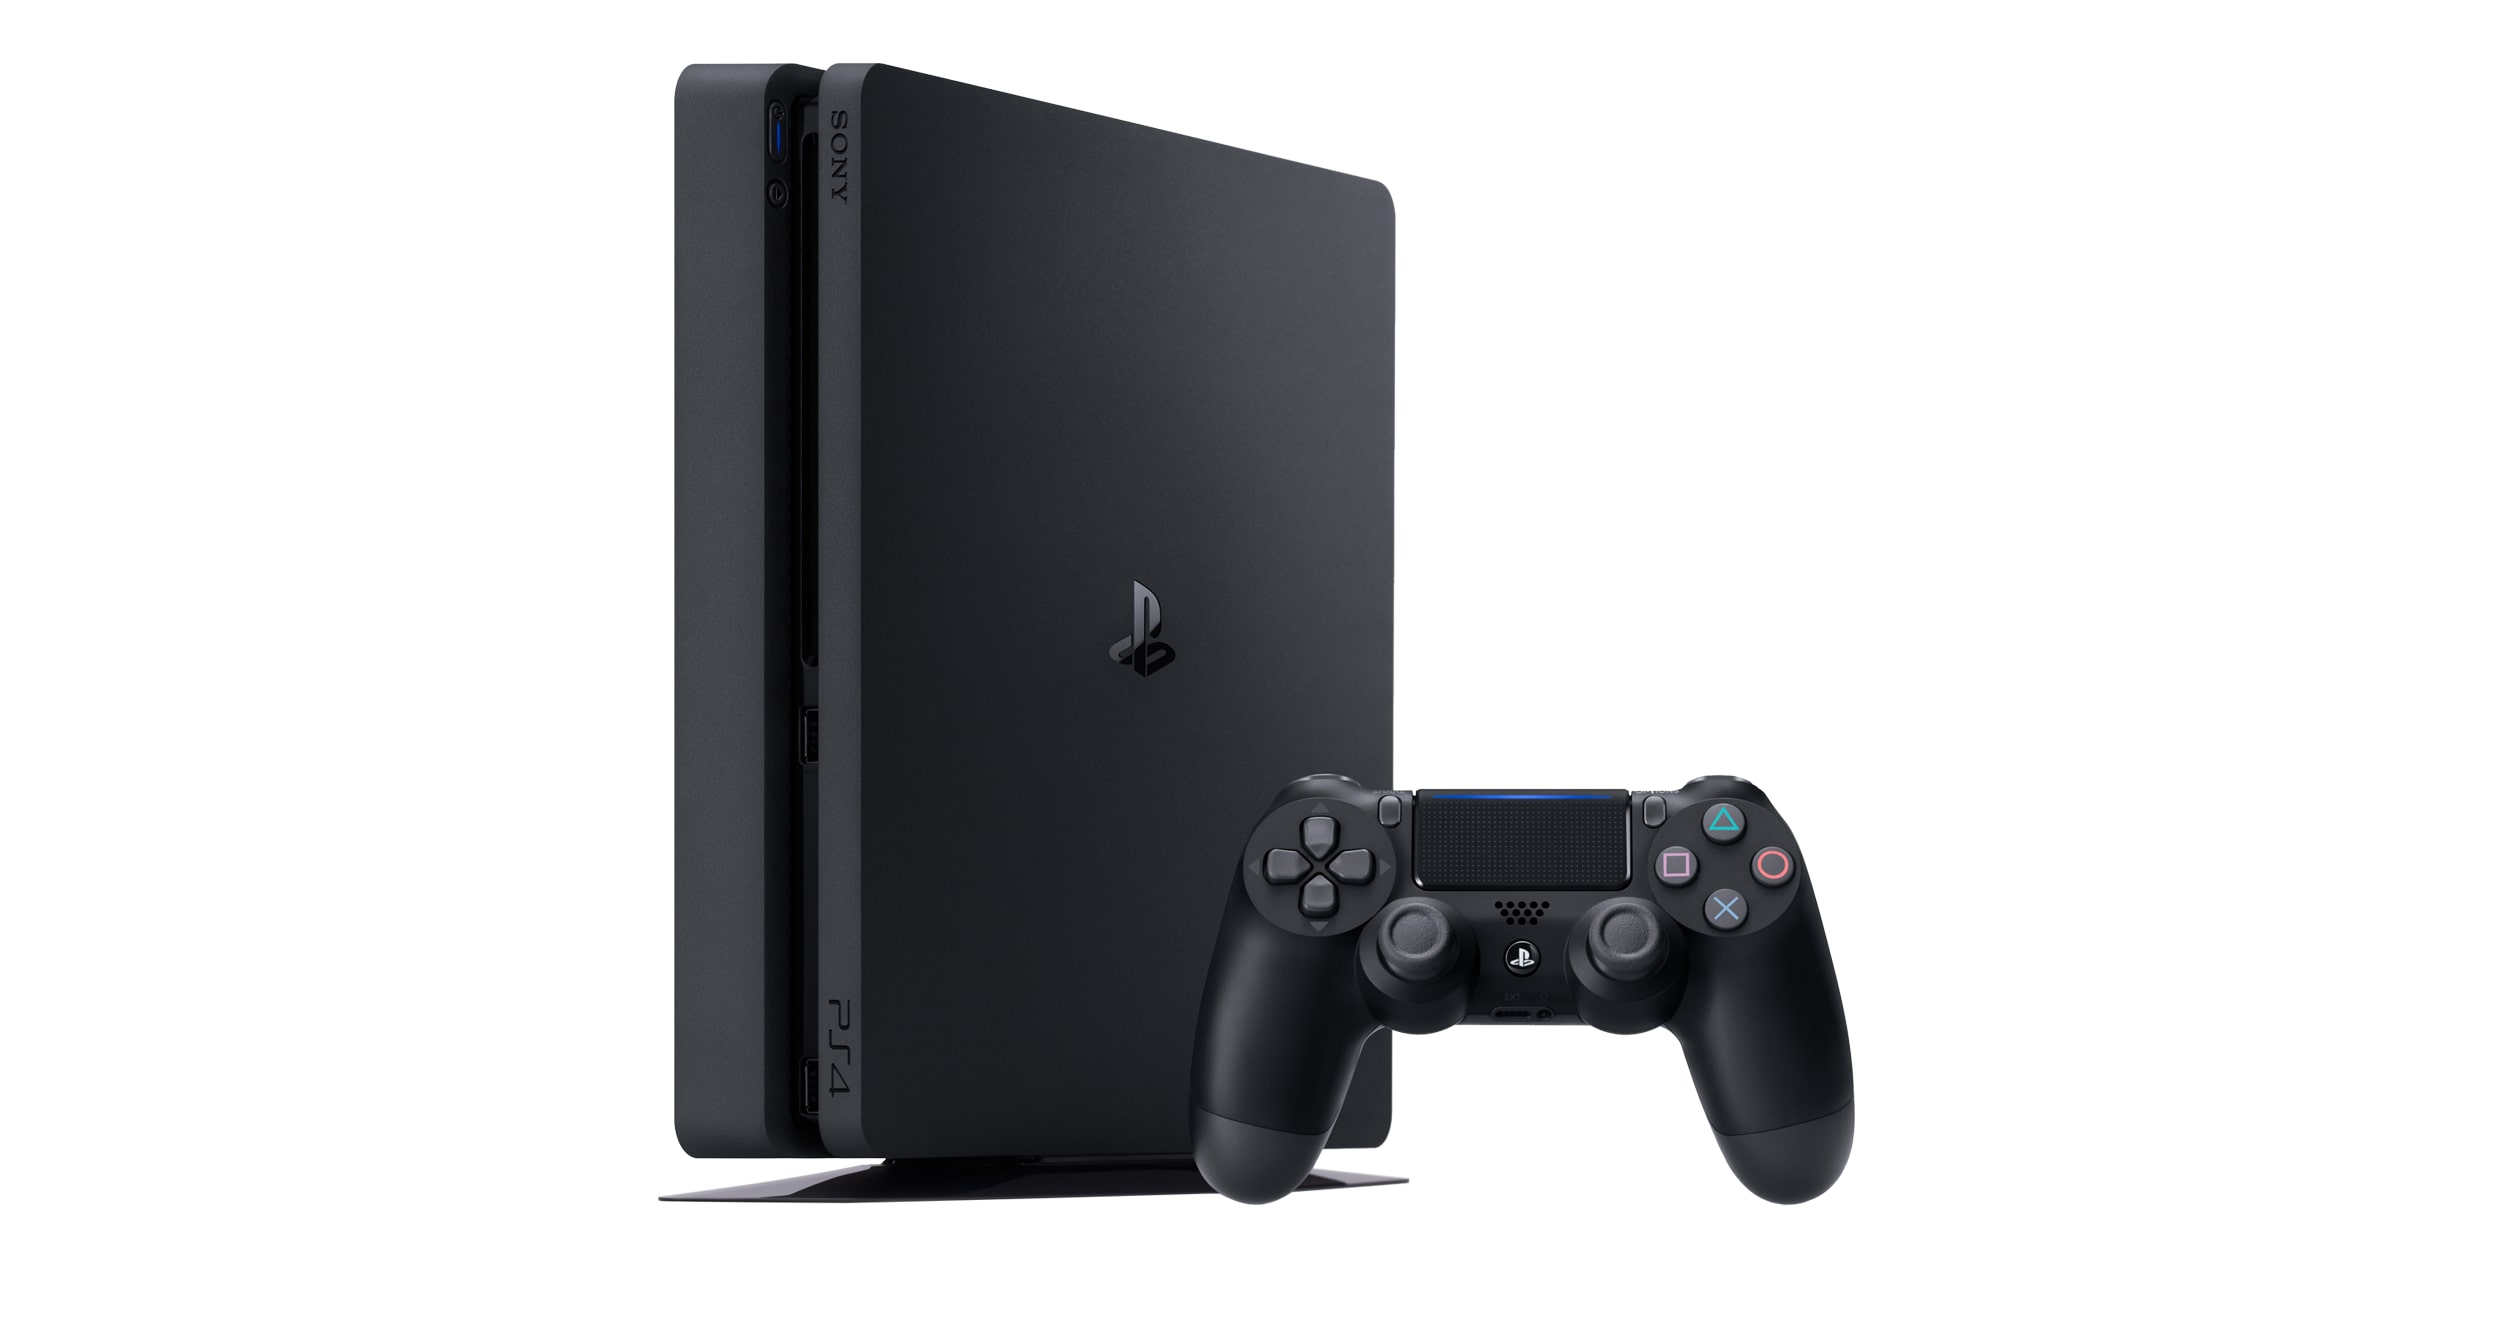 Ps4 Gameconsole Met Amd Radeon Gpu Playstation 4 Sony Nl